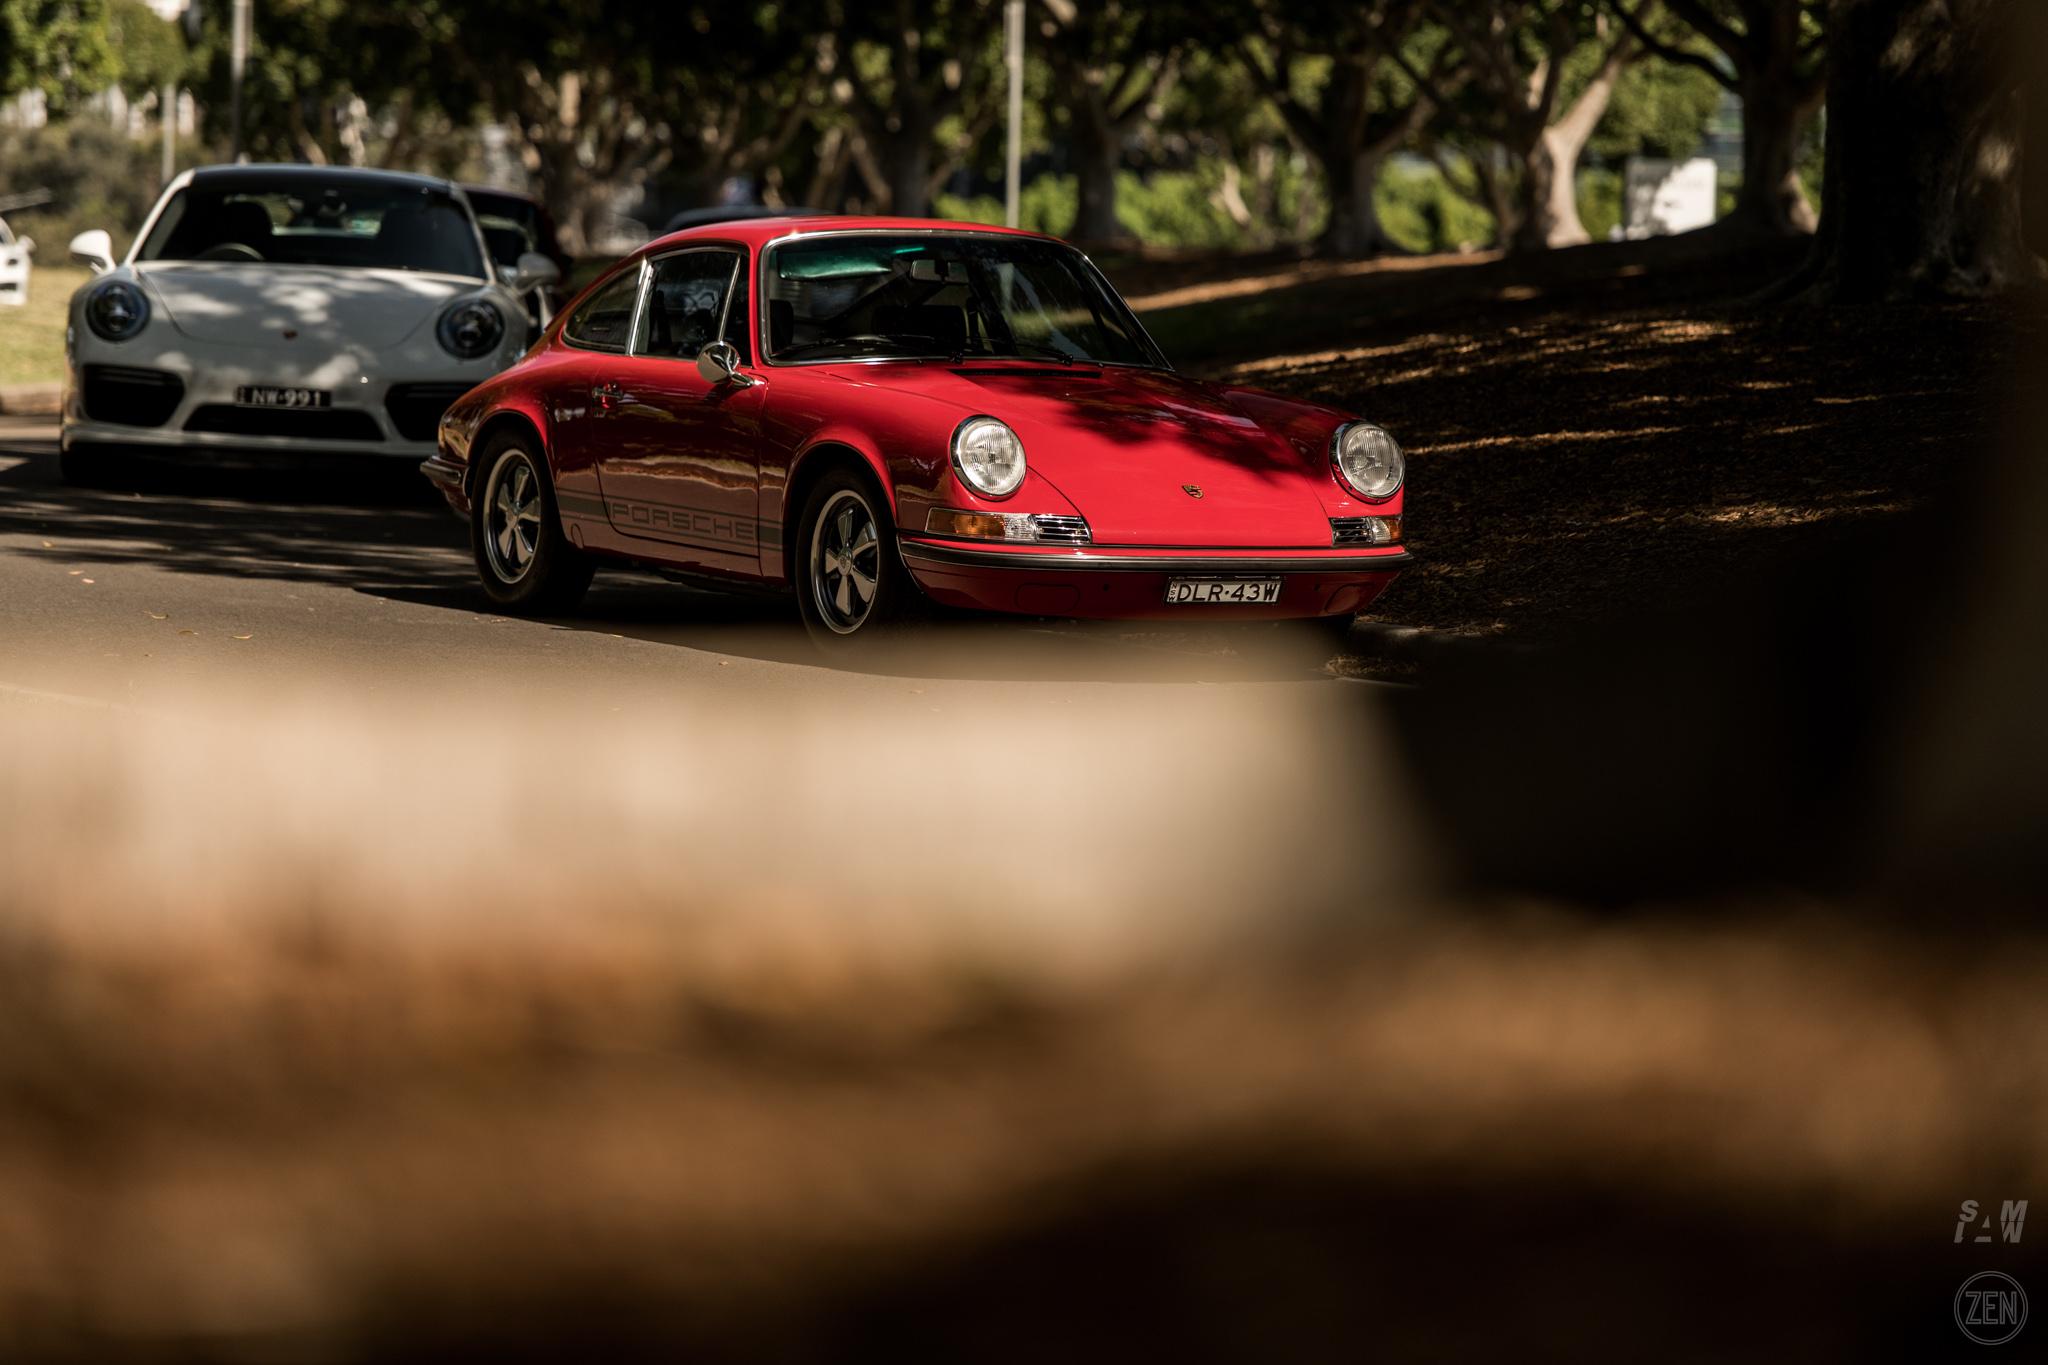 2019-10-27 - Autohaus Porsches & Coffee 180